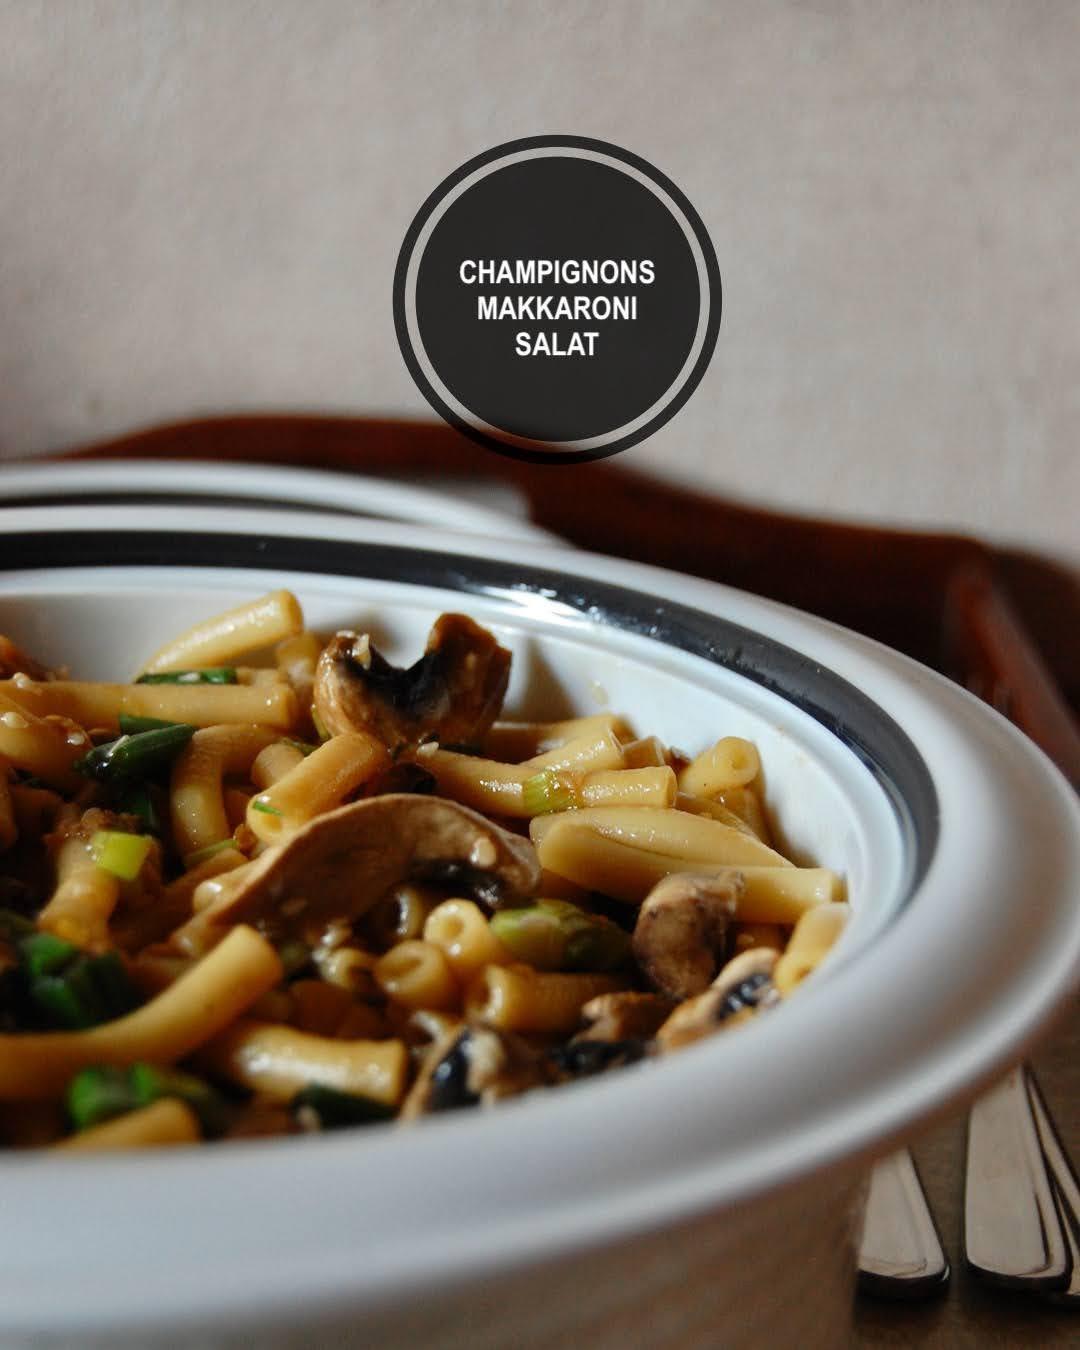 Rezept asiatischer Champignons und Makkaroni Salat